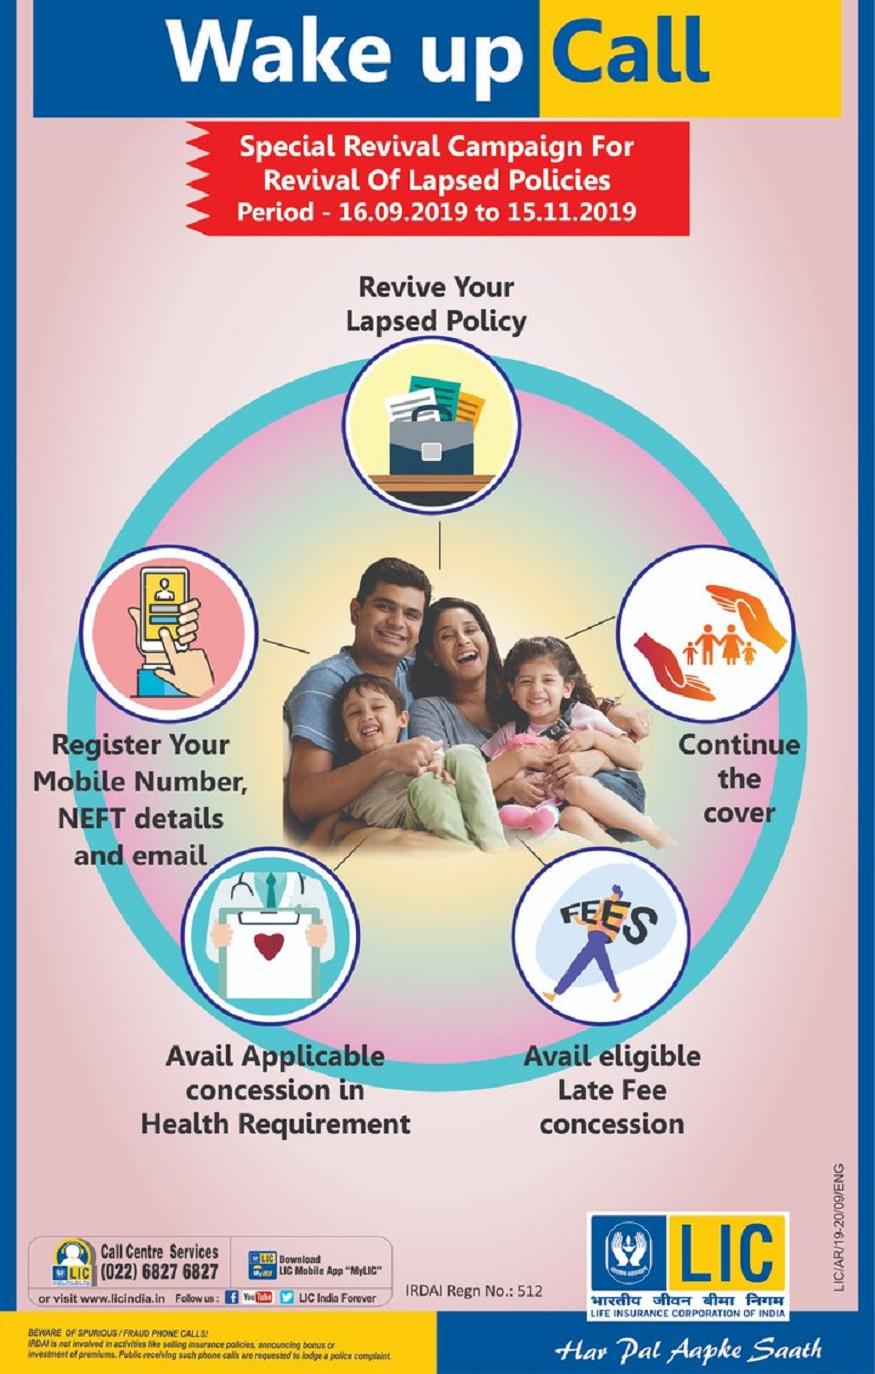 lic special revival campaign 2019, lic revival campaign, lic revival campaign 2019, lic revival campaign 2019-20, lic lapsed policy renewal scheme 2019, lic policy revival campaign 2019, lic policy revival online payment, Life Insurance Corporation of India, ఎల్ఐసీ స్పెషల్ రివైవల్ క్యాంపైన్ 2019, ఎల్ఐసీ రివైవల్ క్యాంపైన్, ఎల్ఐసీ రివైవల్ క్యాంపైన్ 2019, ఎల్ఐసీ పాలసీ రివైవల్ క్యాంపైన్ 2019, ఎల్ఐసీ పాలసీ రెన్యువల్ క్యాంపైన్ 2019, లైఫ్ ఇన్స్యూరెన్స్ కార్పొరేషన్ ఆఫ్ ఇండియా